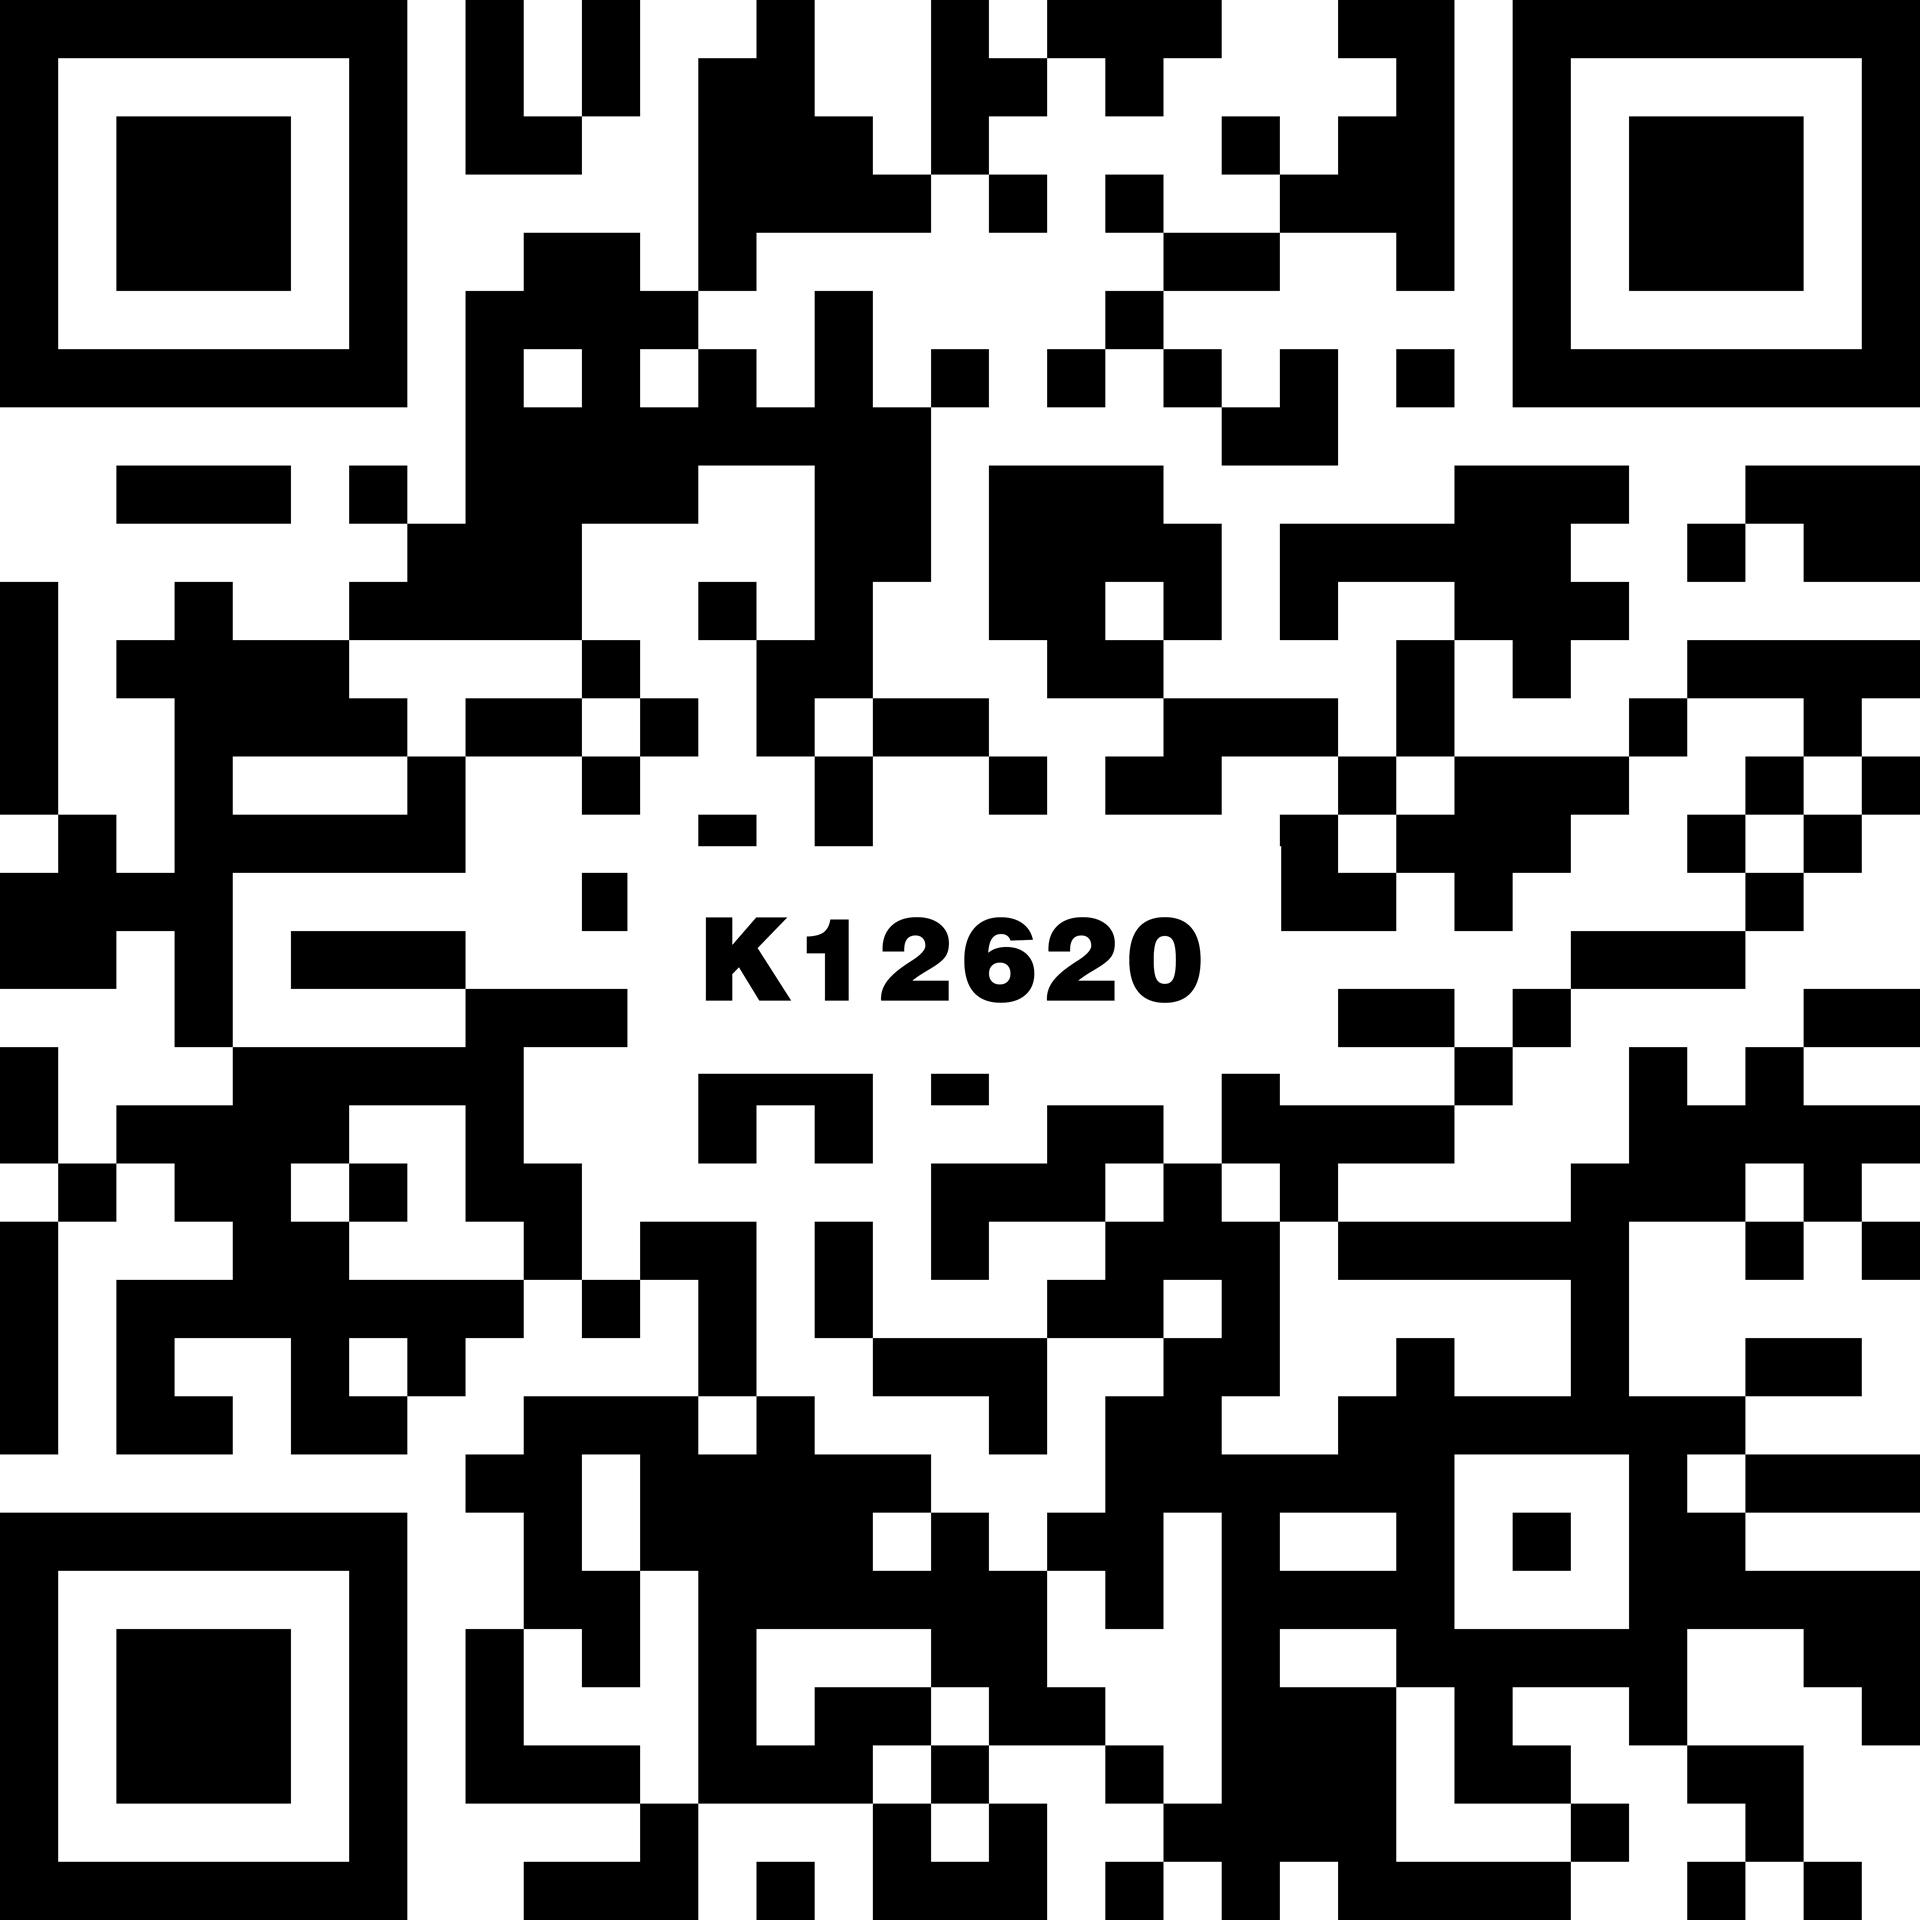 K12620